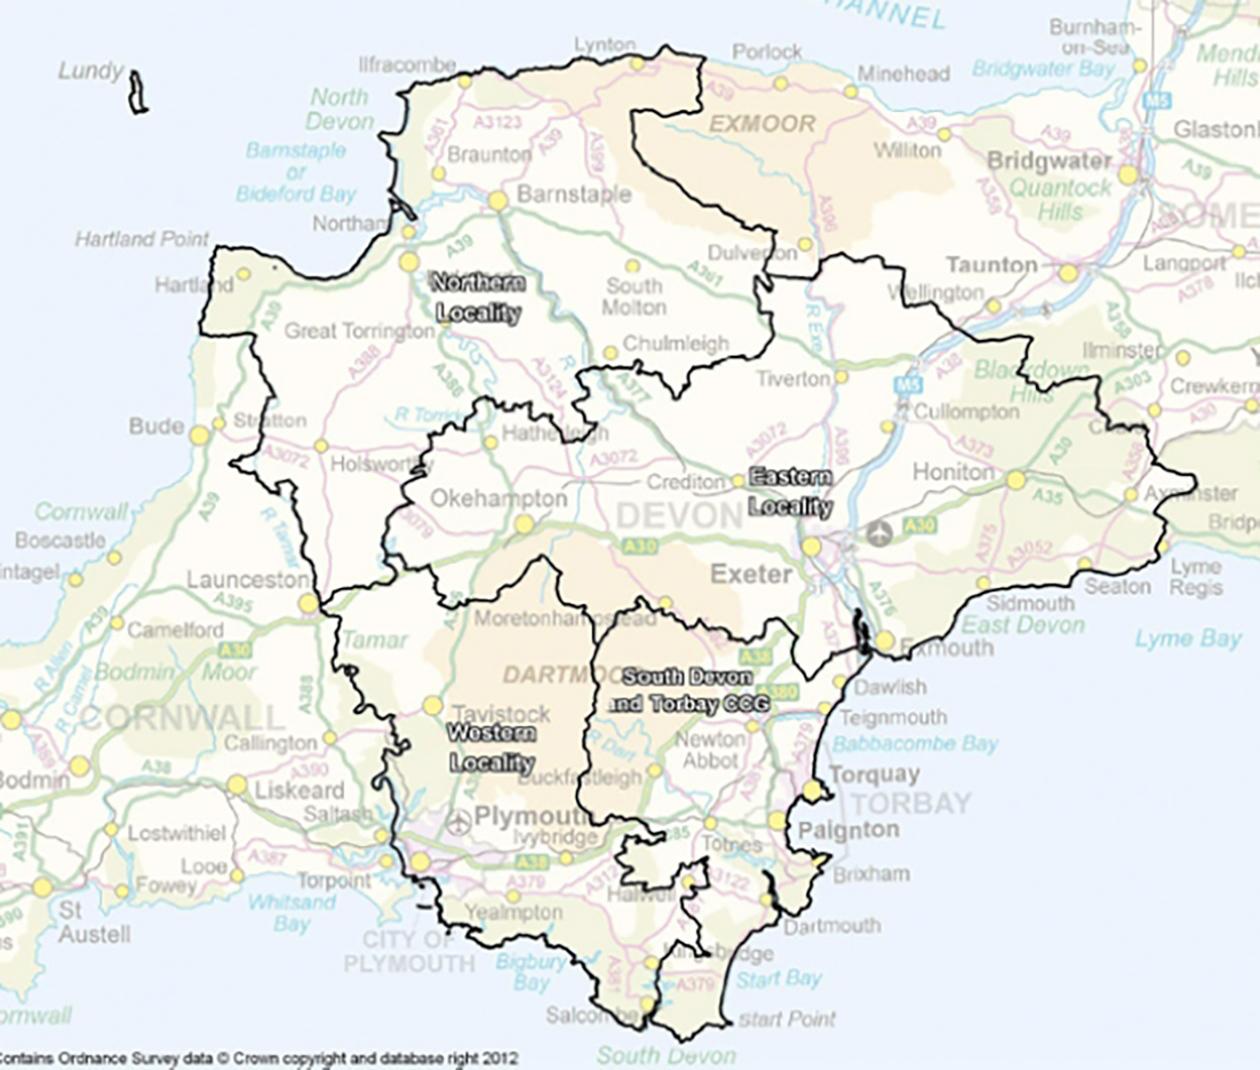 Map of Devon (showing localities)